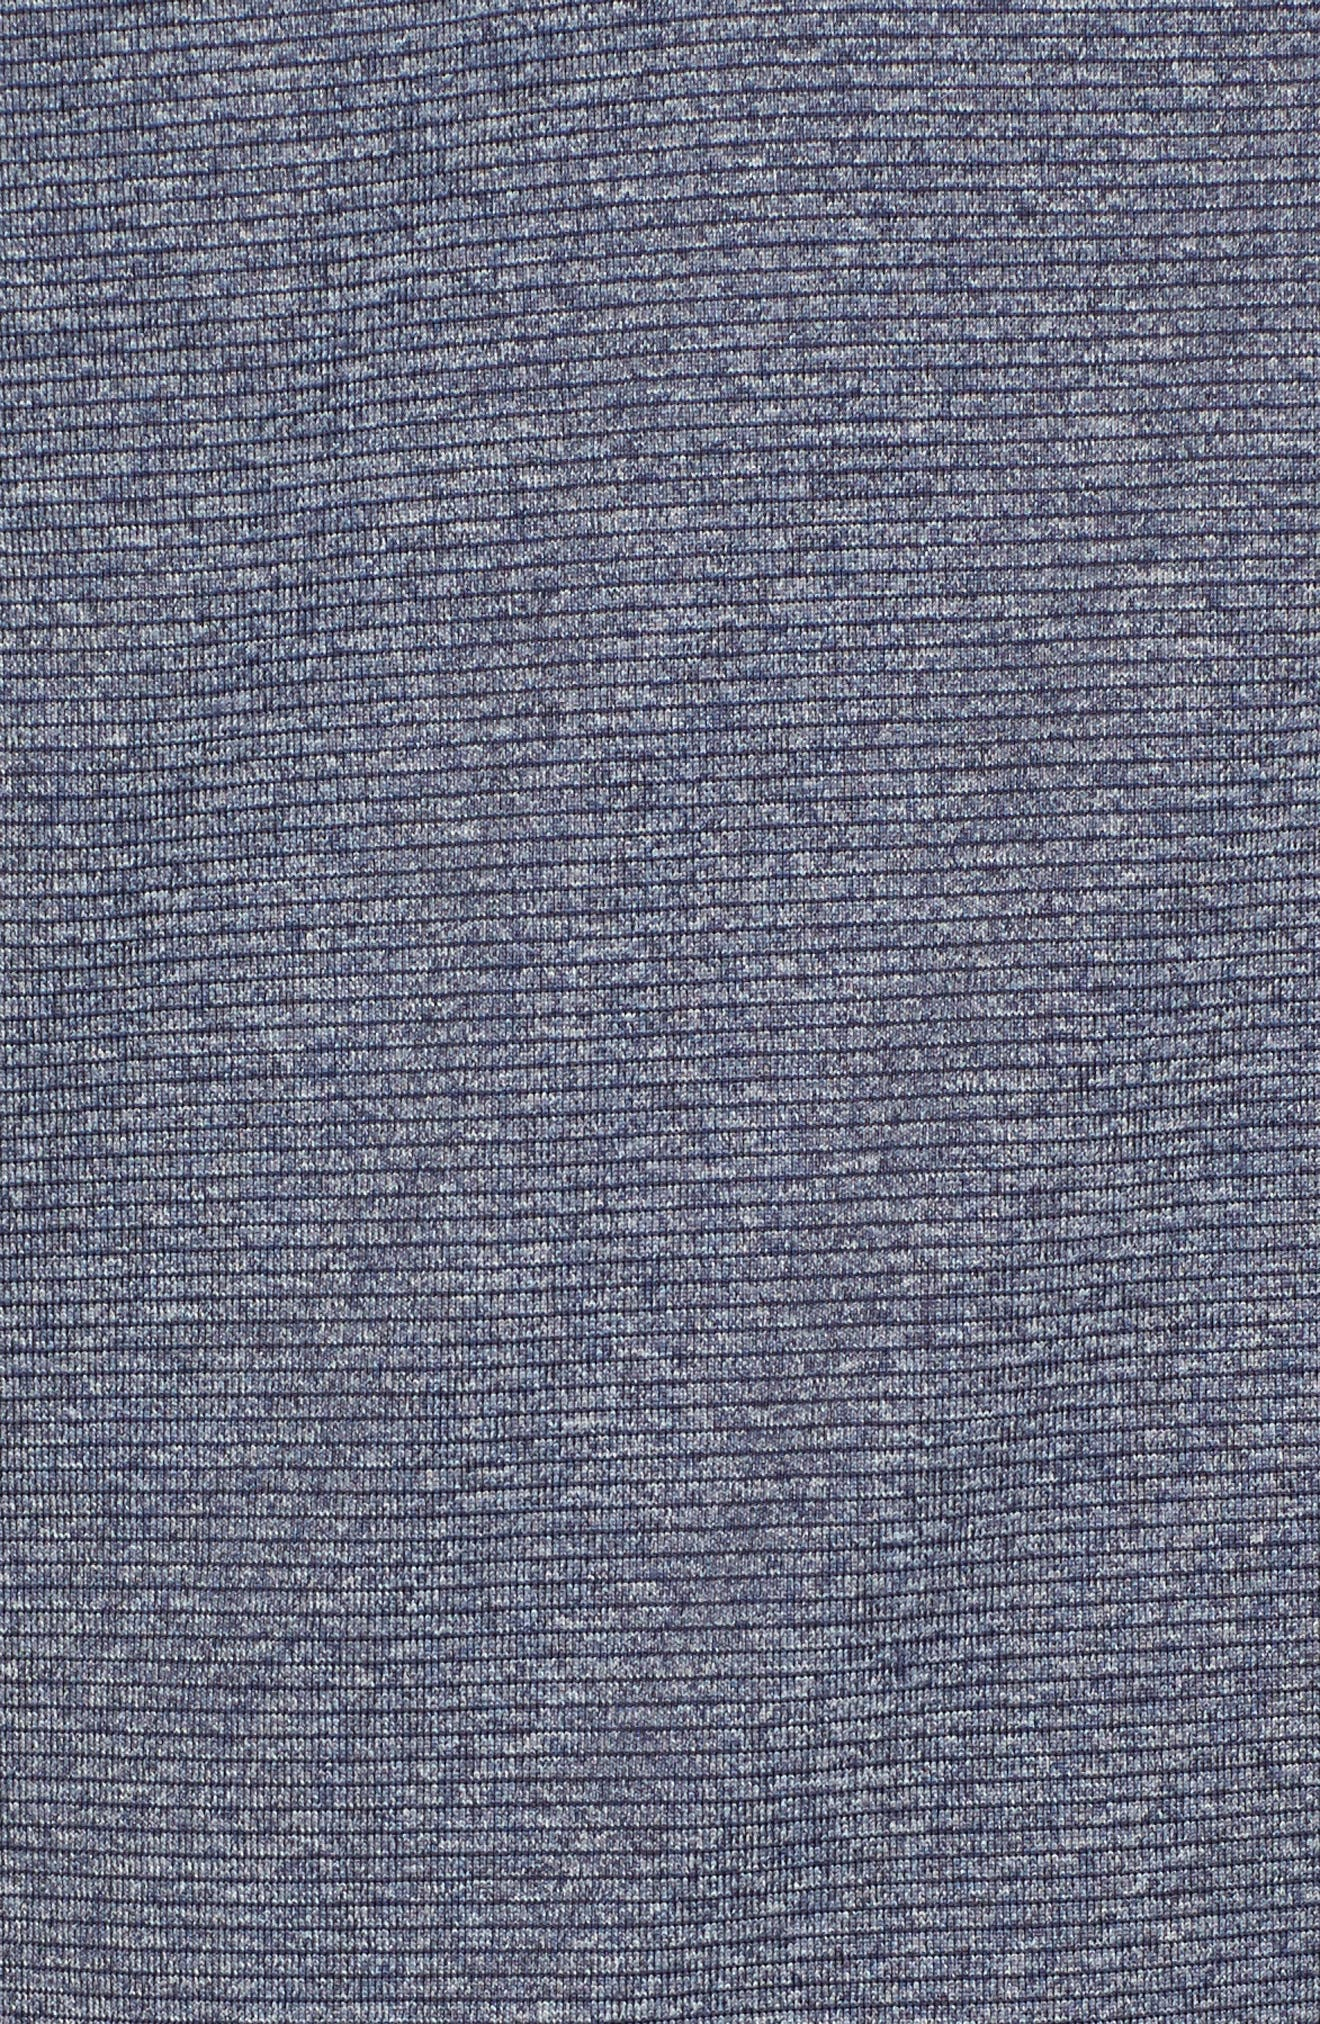 Shoreline - Houston Texans Half Zip Pullover,                             Alternate thumbnail 5, color,                             Liberty Navy Heather